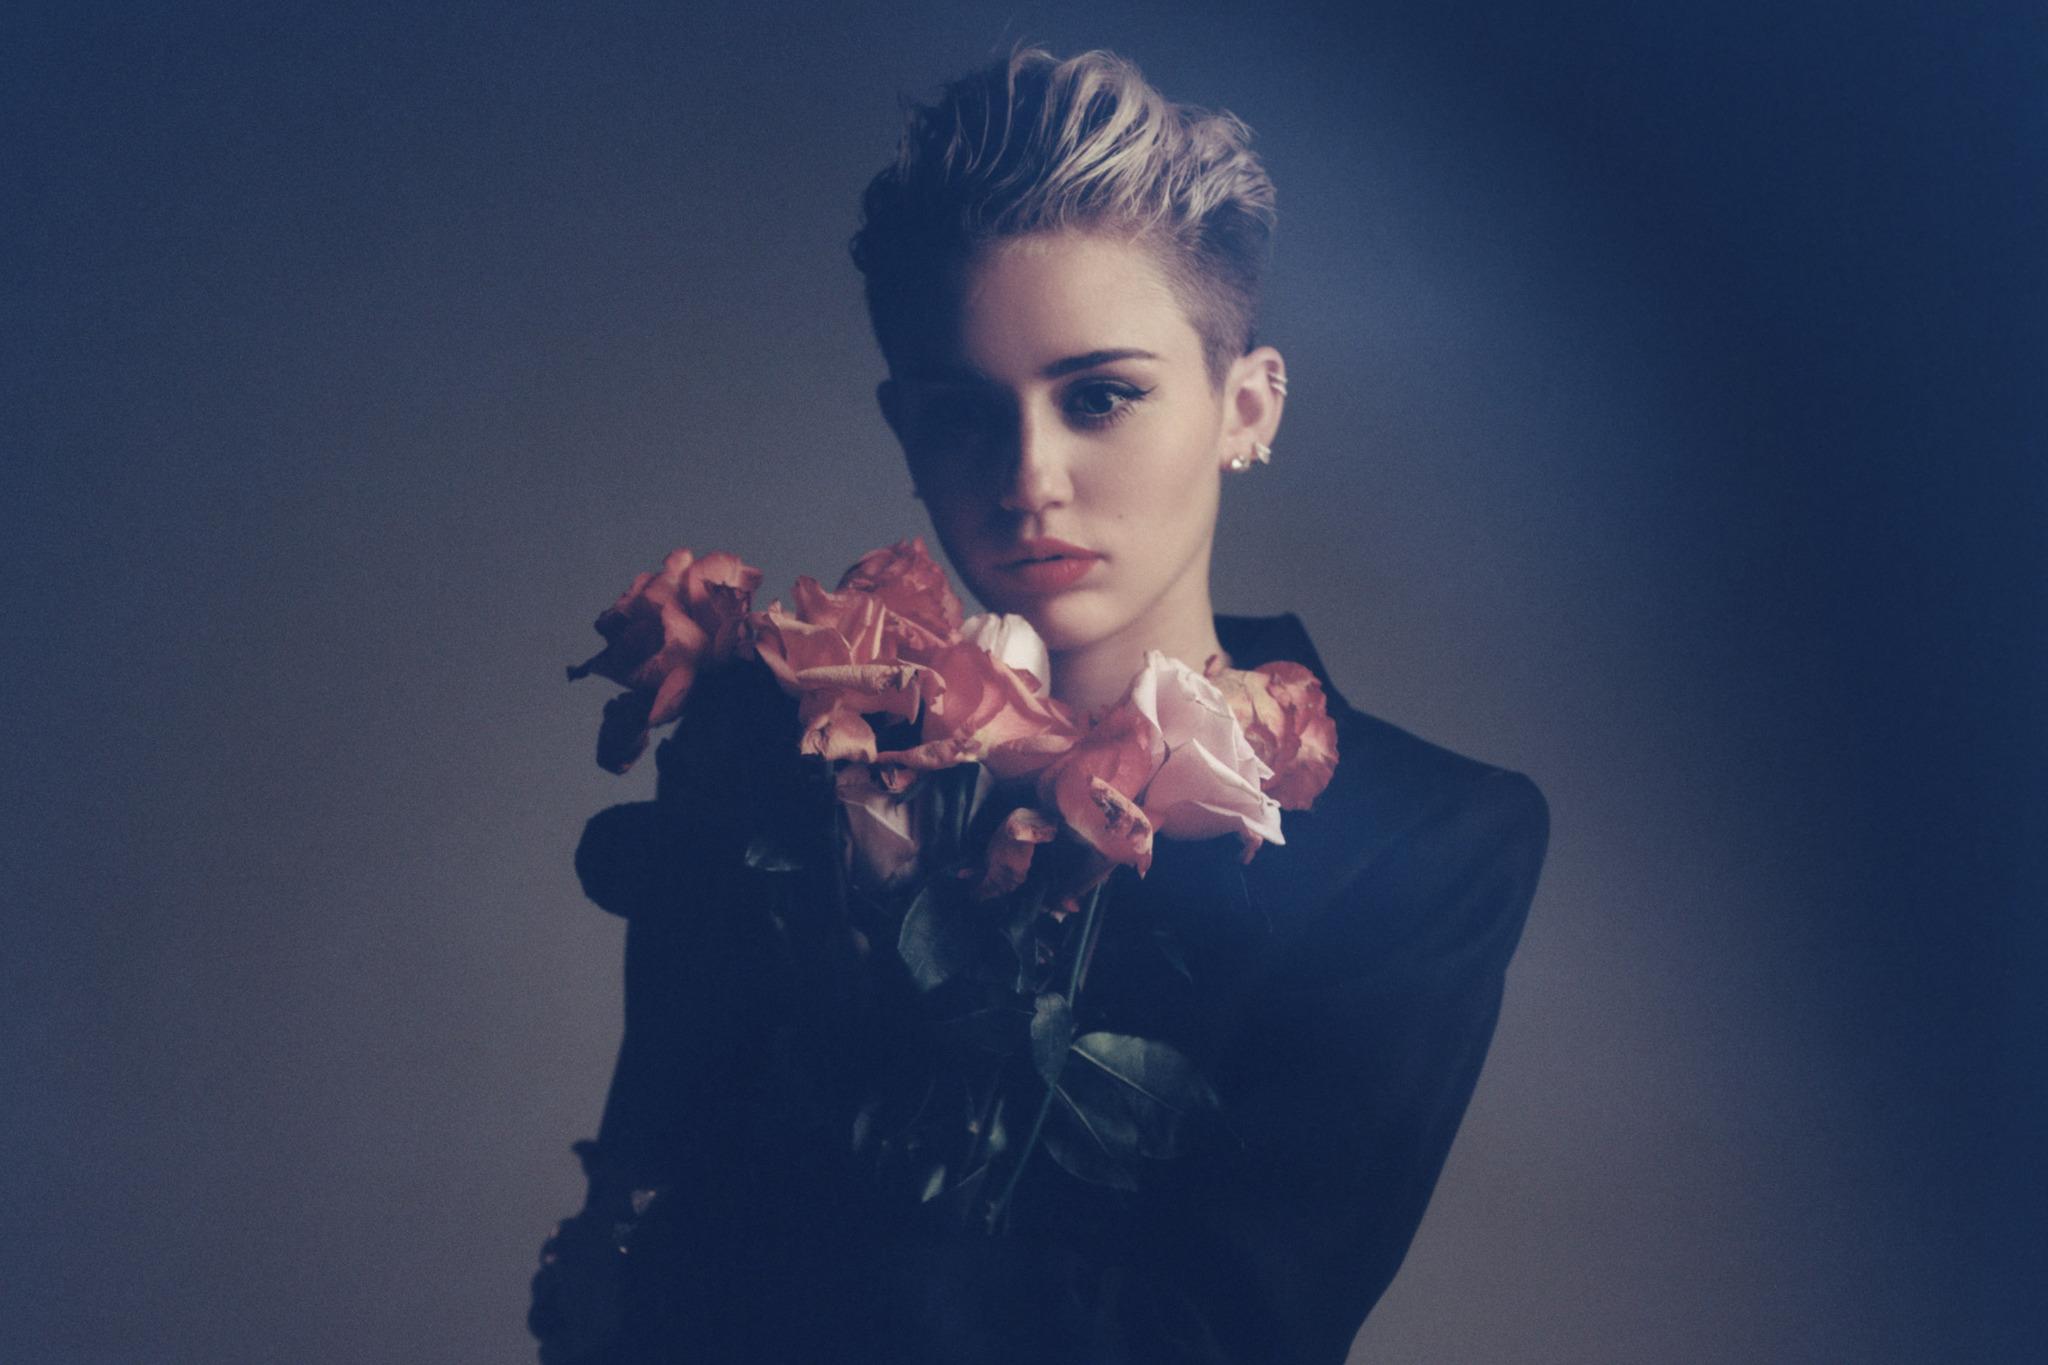 Miley Cyrus + Icona Pop + Sky Ferreira